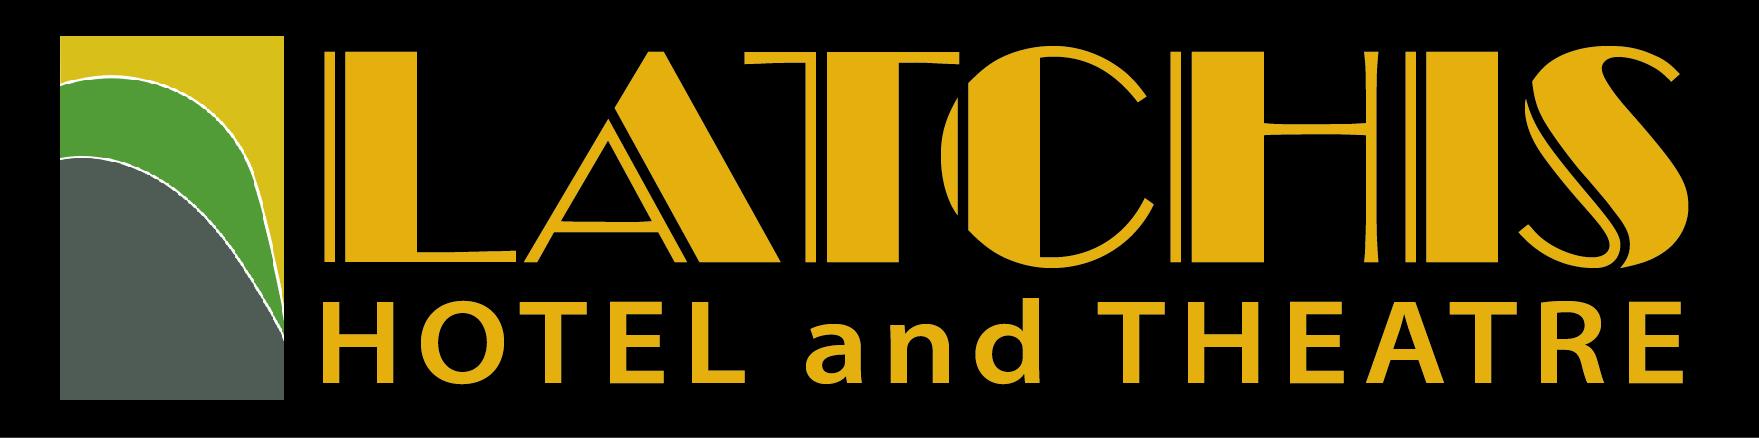 Latchis Logo Gold Blk Box.jpg